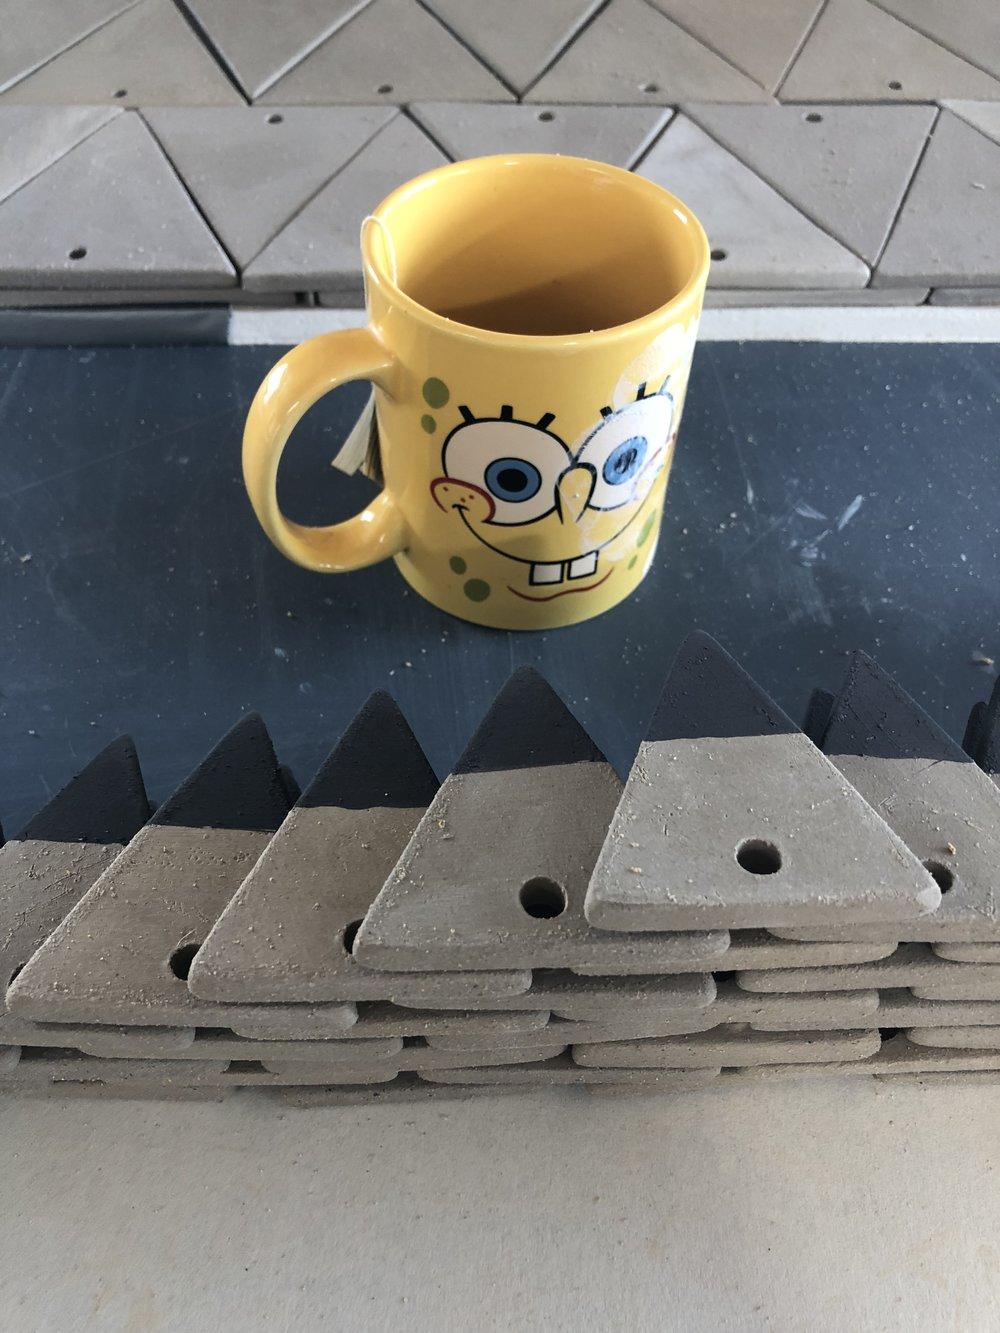 Sponge Bob triangle parts